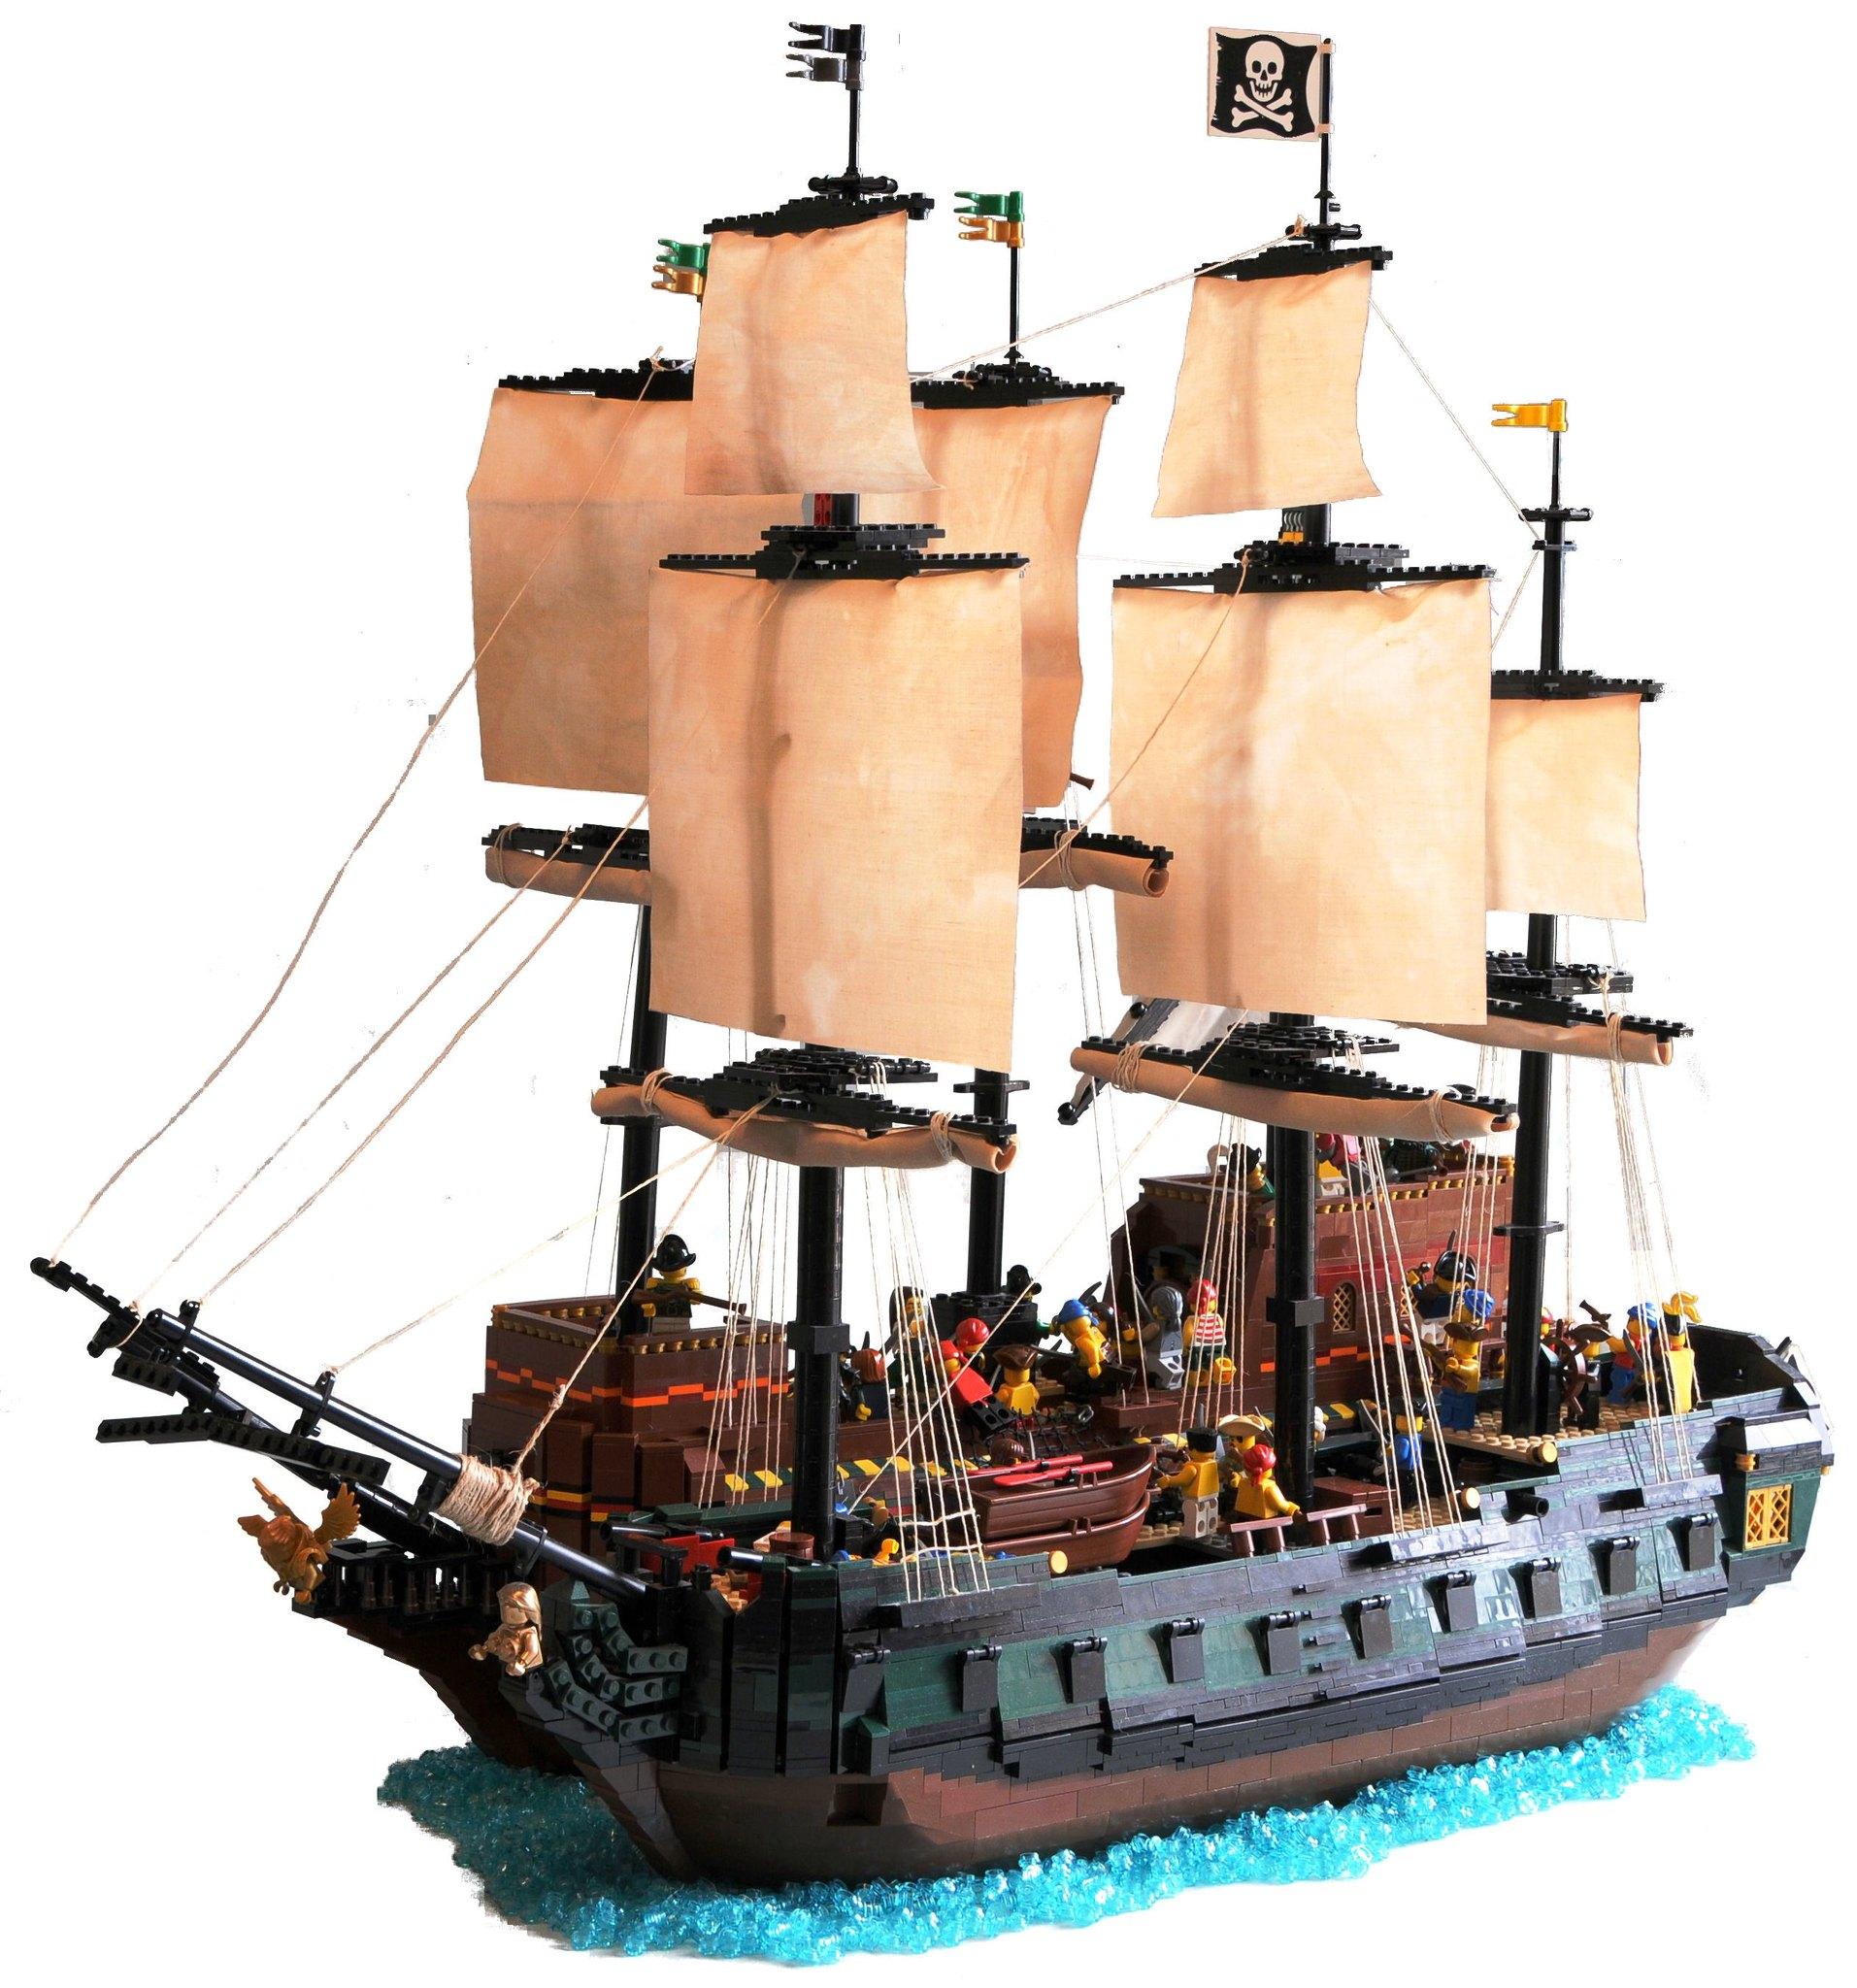 Taking the treasure galleon